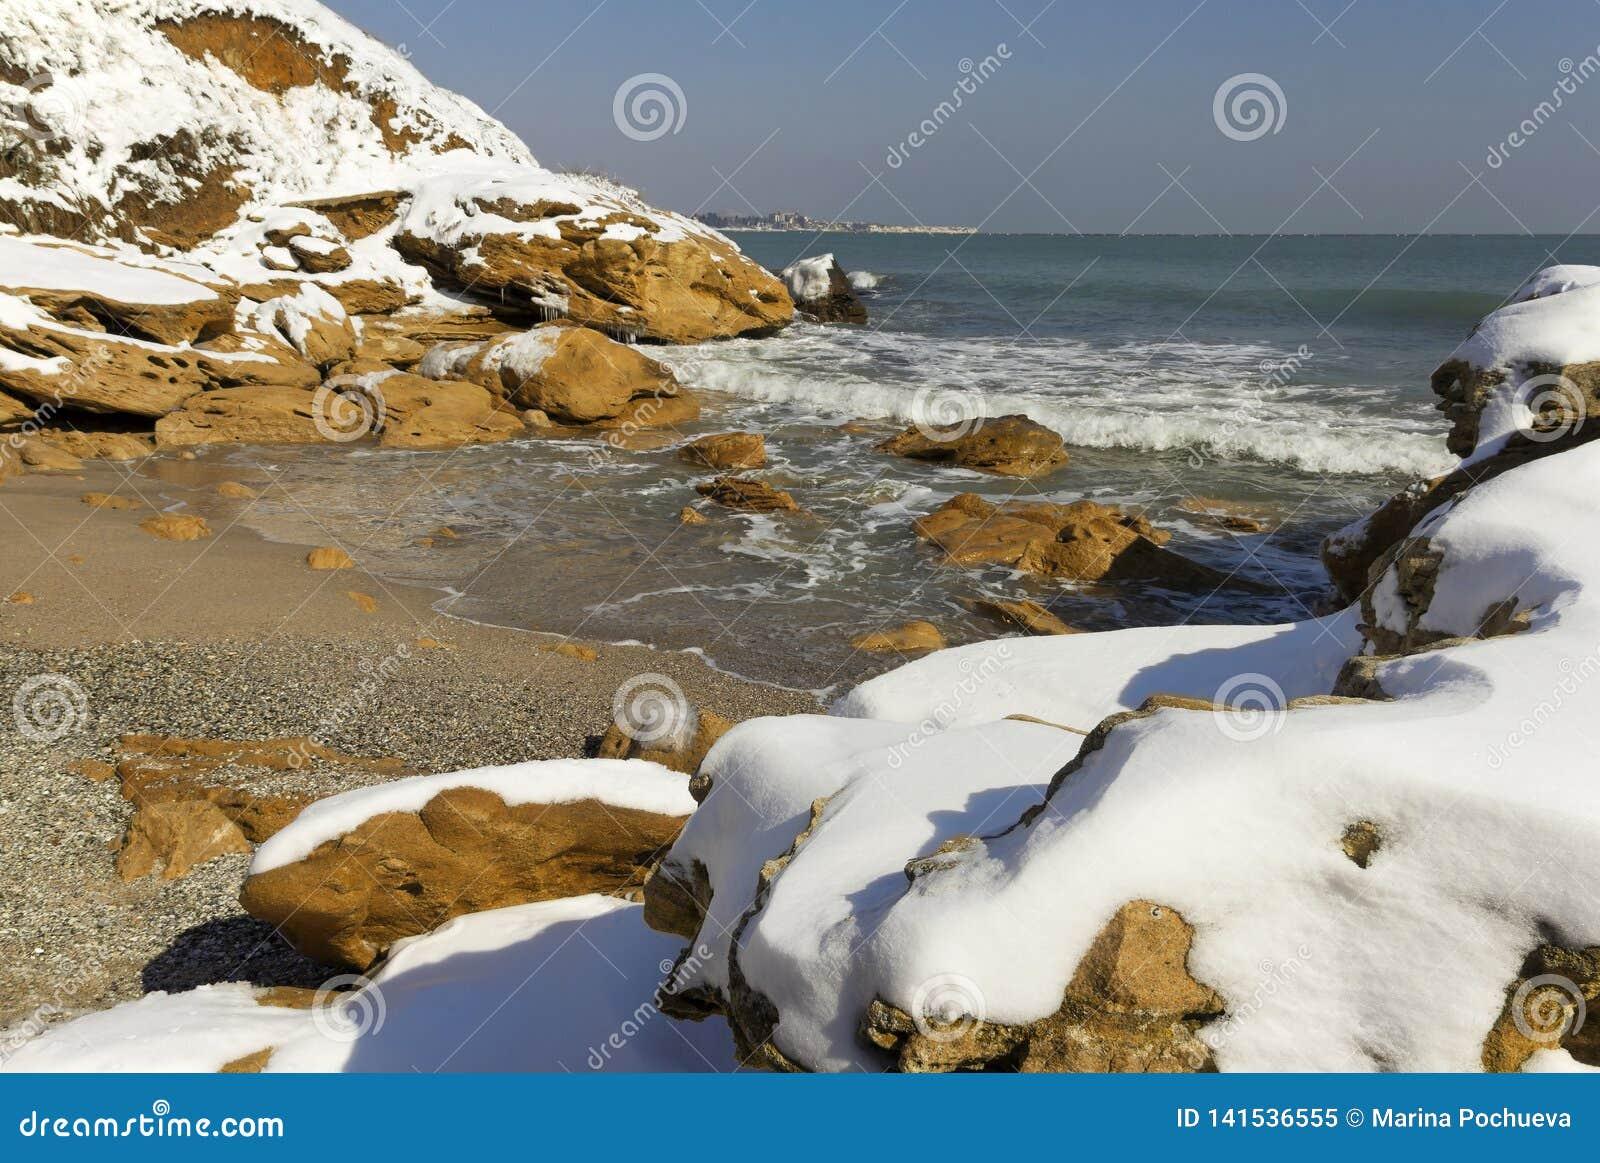 Snow on the sea